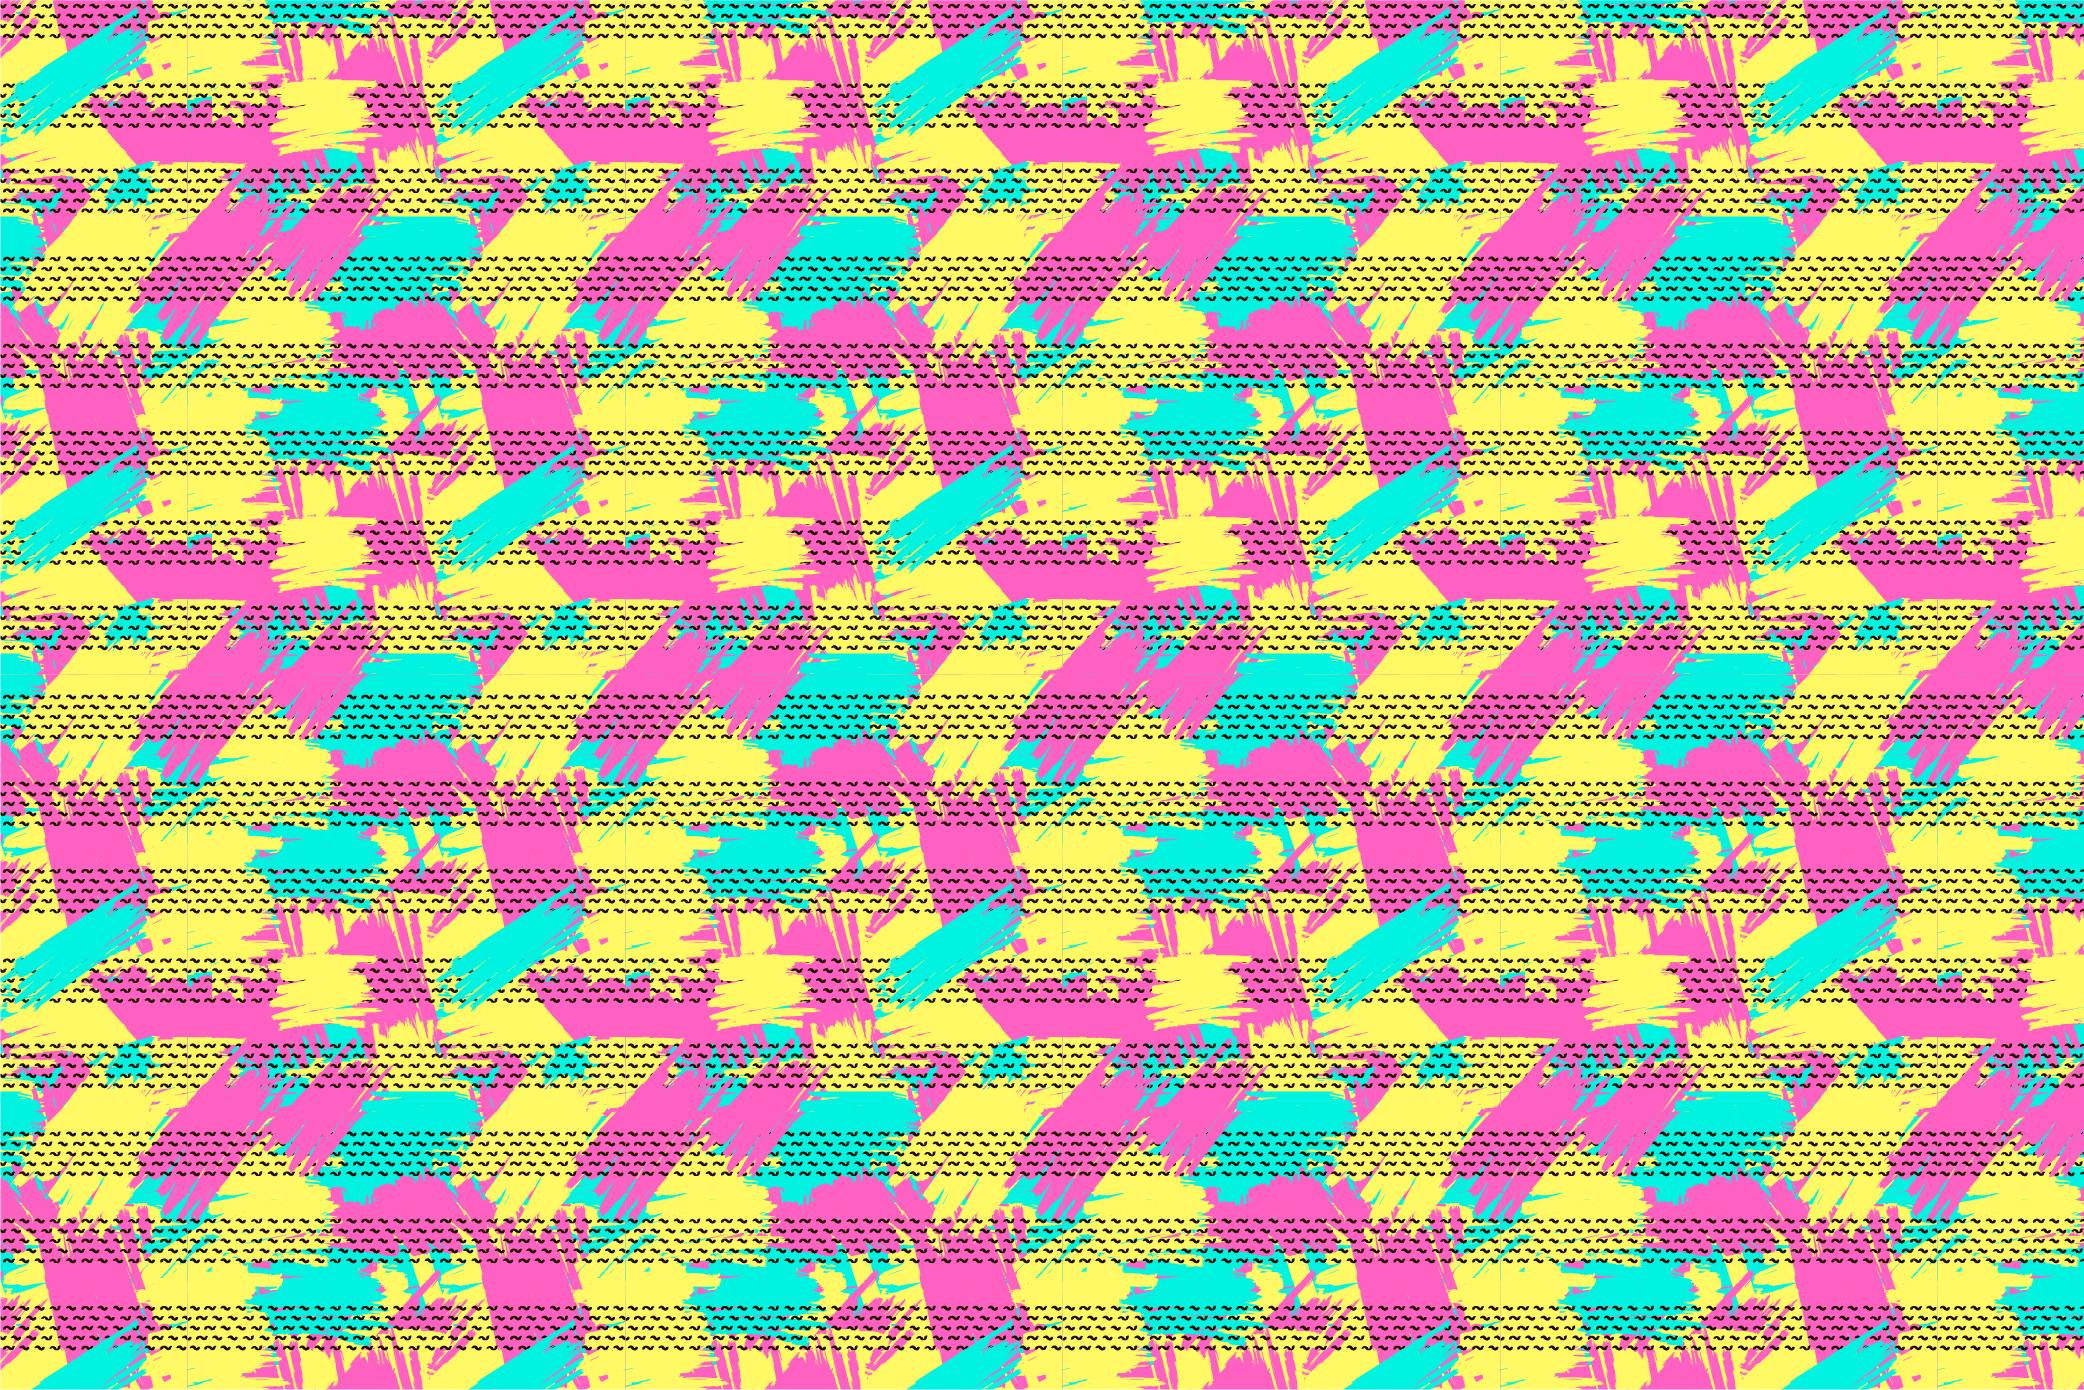 9 Geometric seamless patterns. Ai, EPS, JPG, SVG example image 5